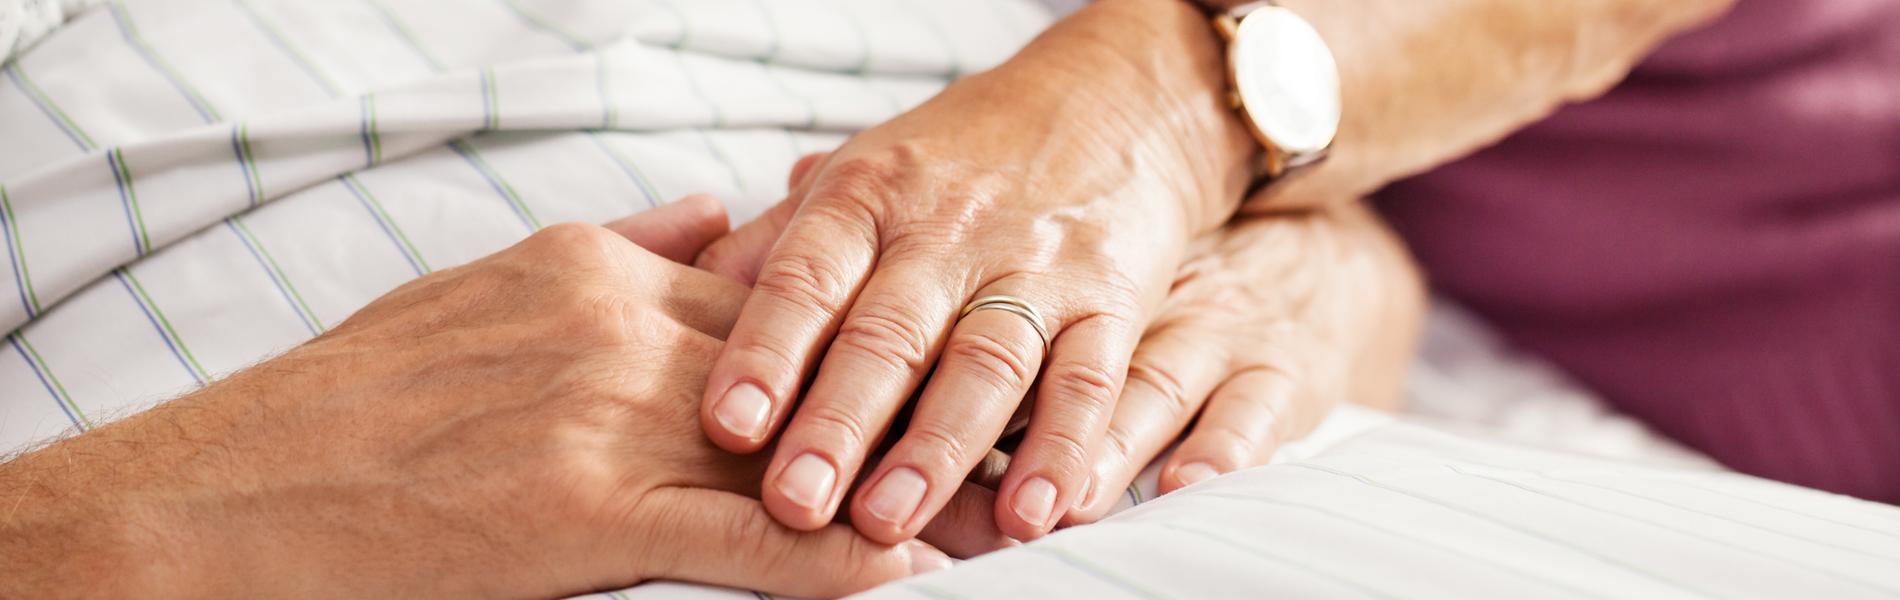 Palliativversorgung in Spandau, Spezialisierte ambulante Palliativversorgung